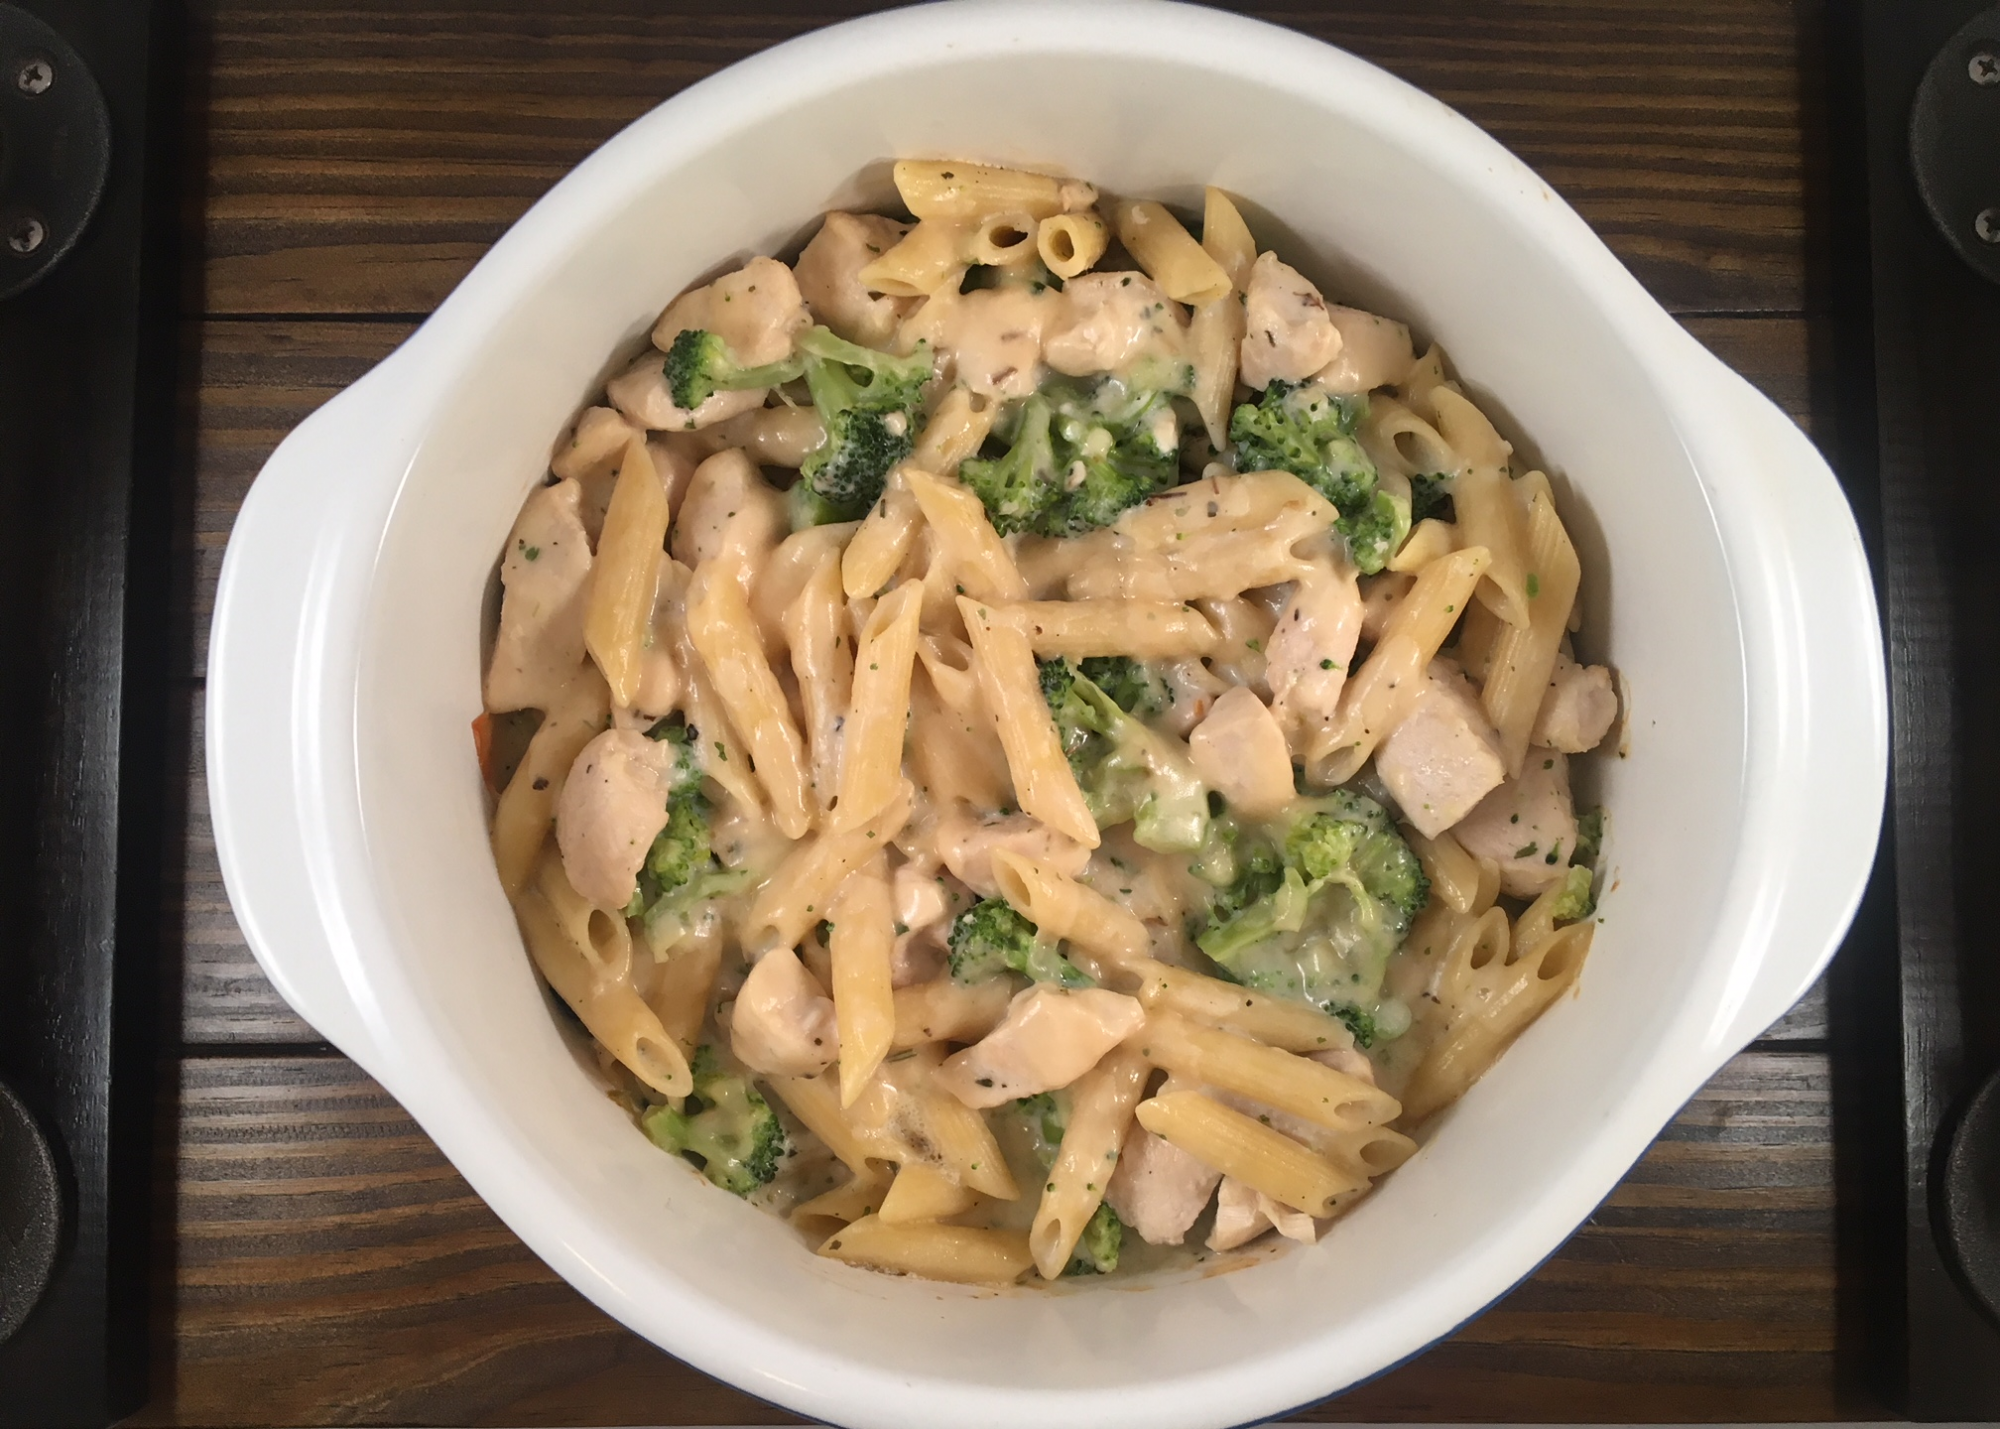 chicken broccoli alfredo in white casserole dish on wooden cutting board